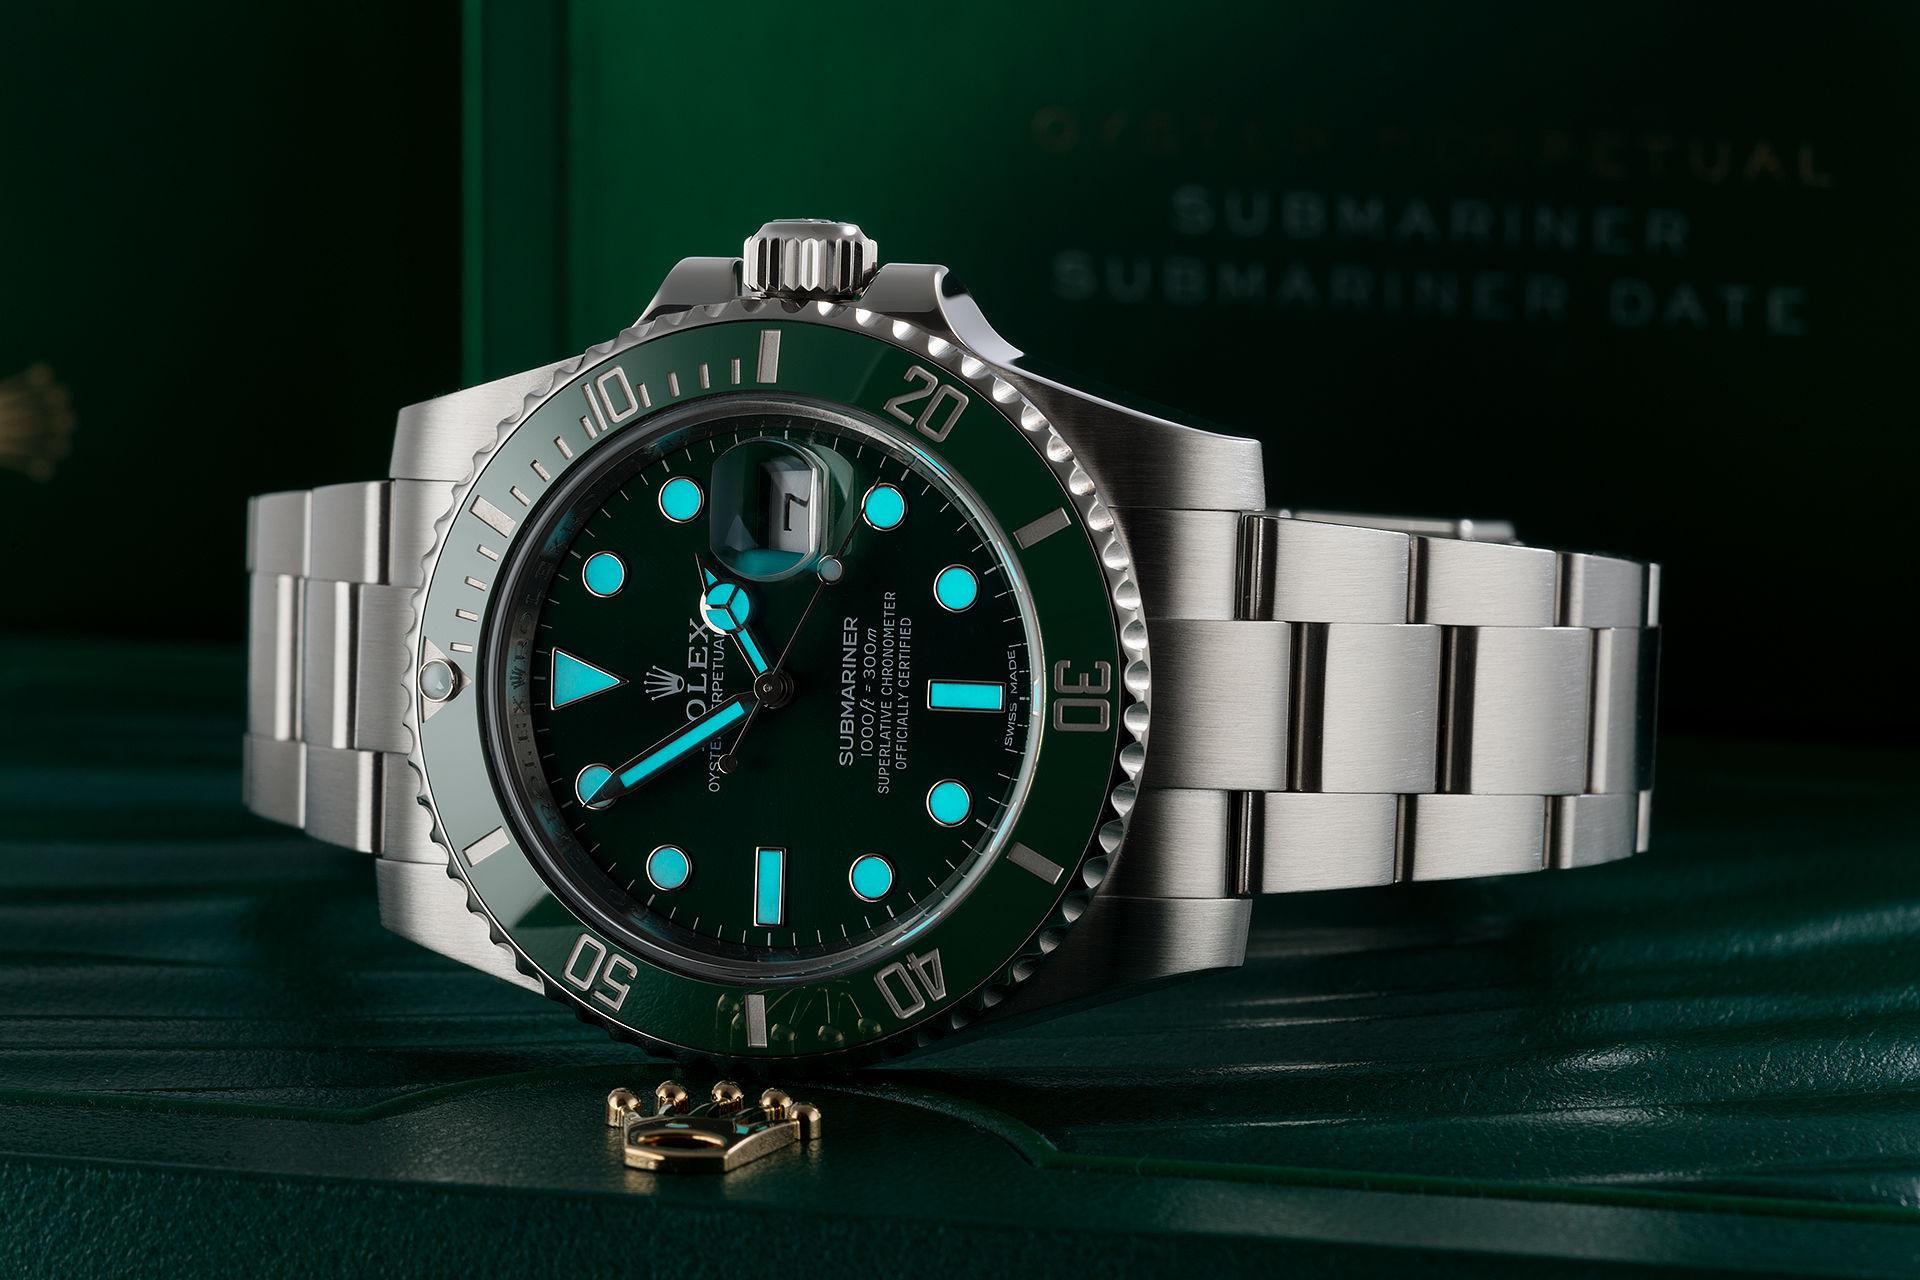 Rolex Submariner Date Watches Ref 116610lv Full Set